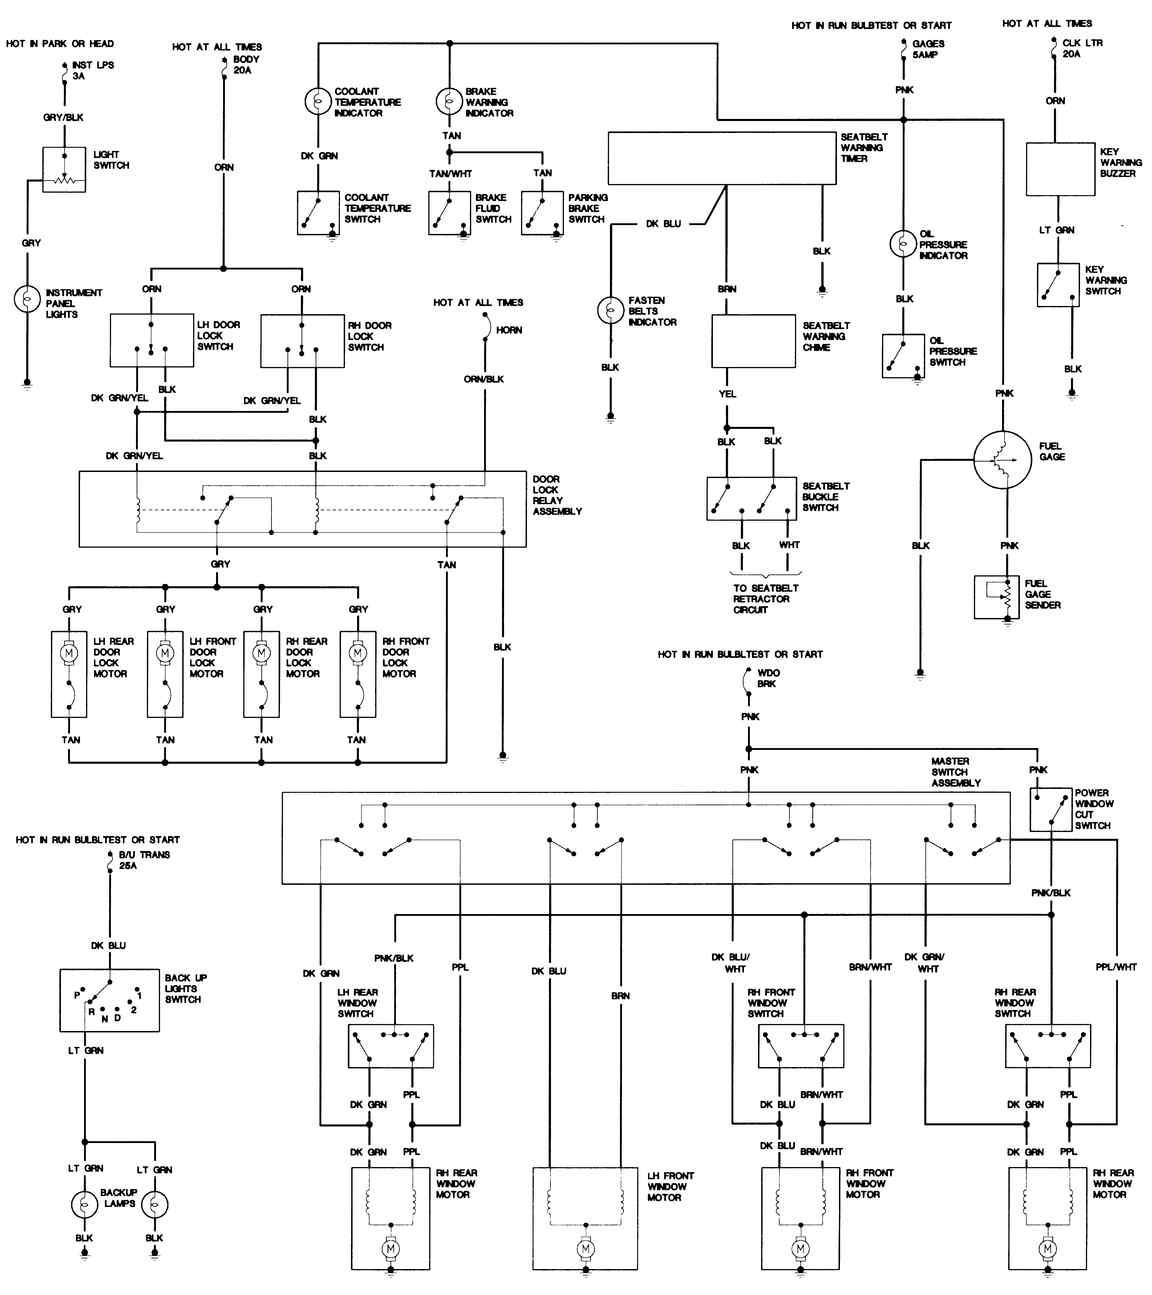 Vr 9013 Cadillac Ac Wiring Diagrams Free Diagram